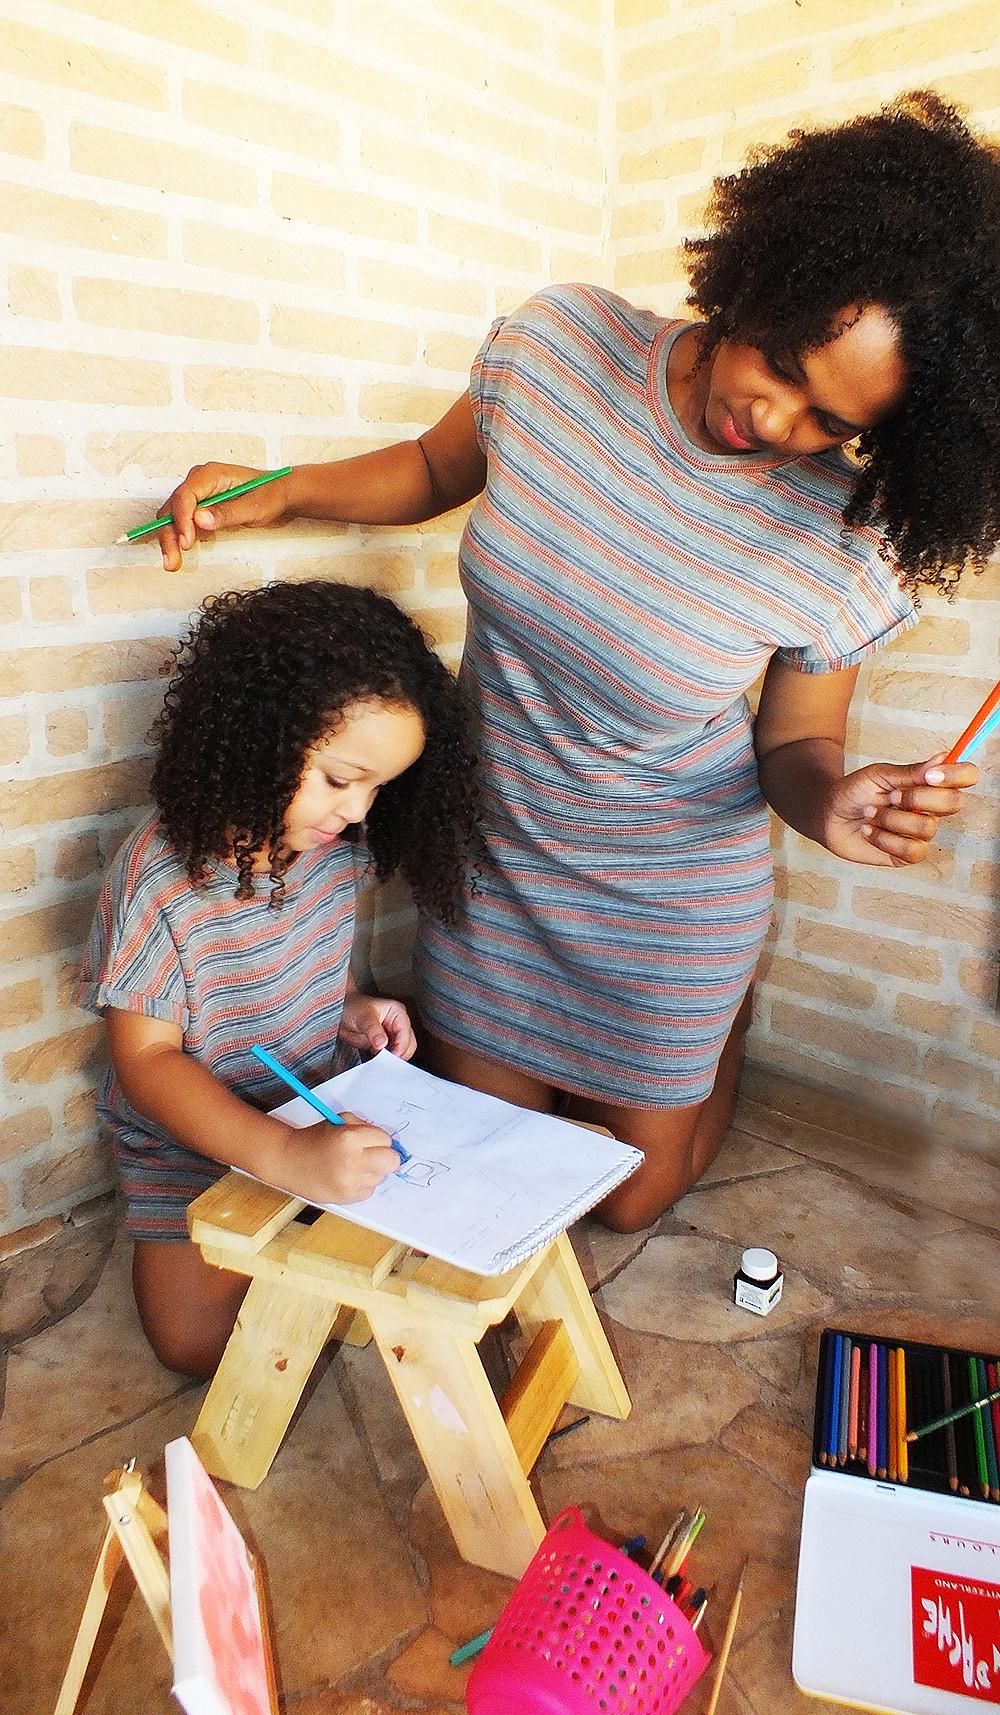 mãe e filha pintando - vestidos tal mãe tal filha